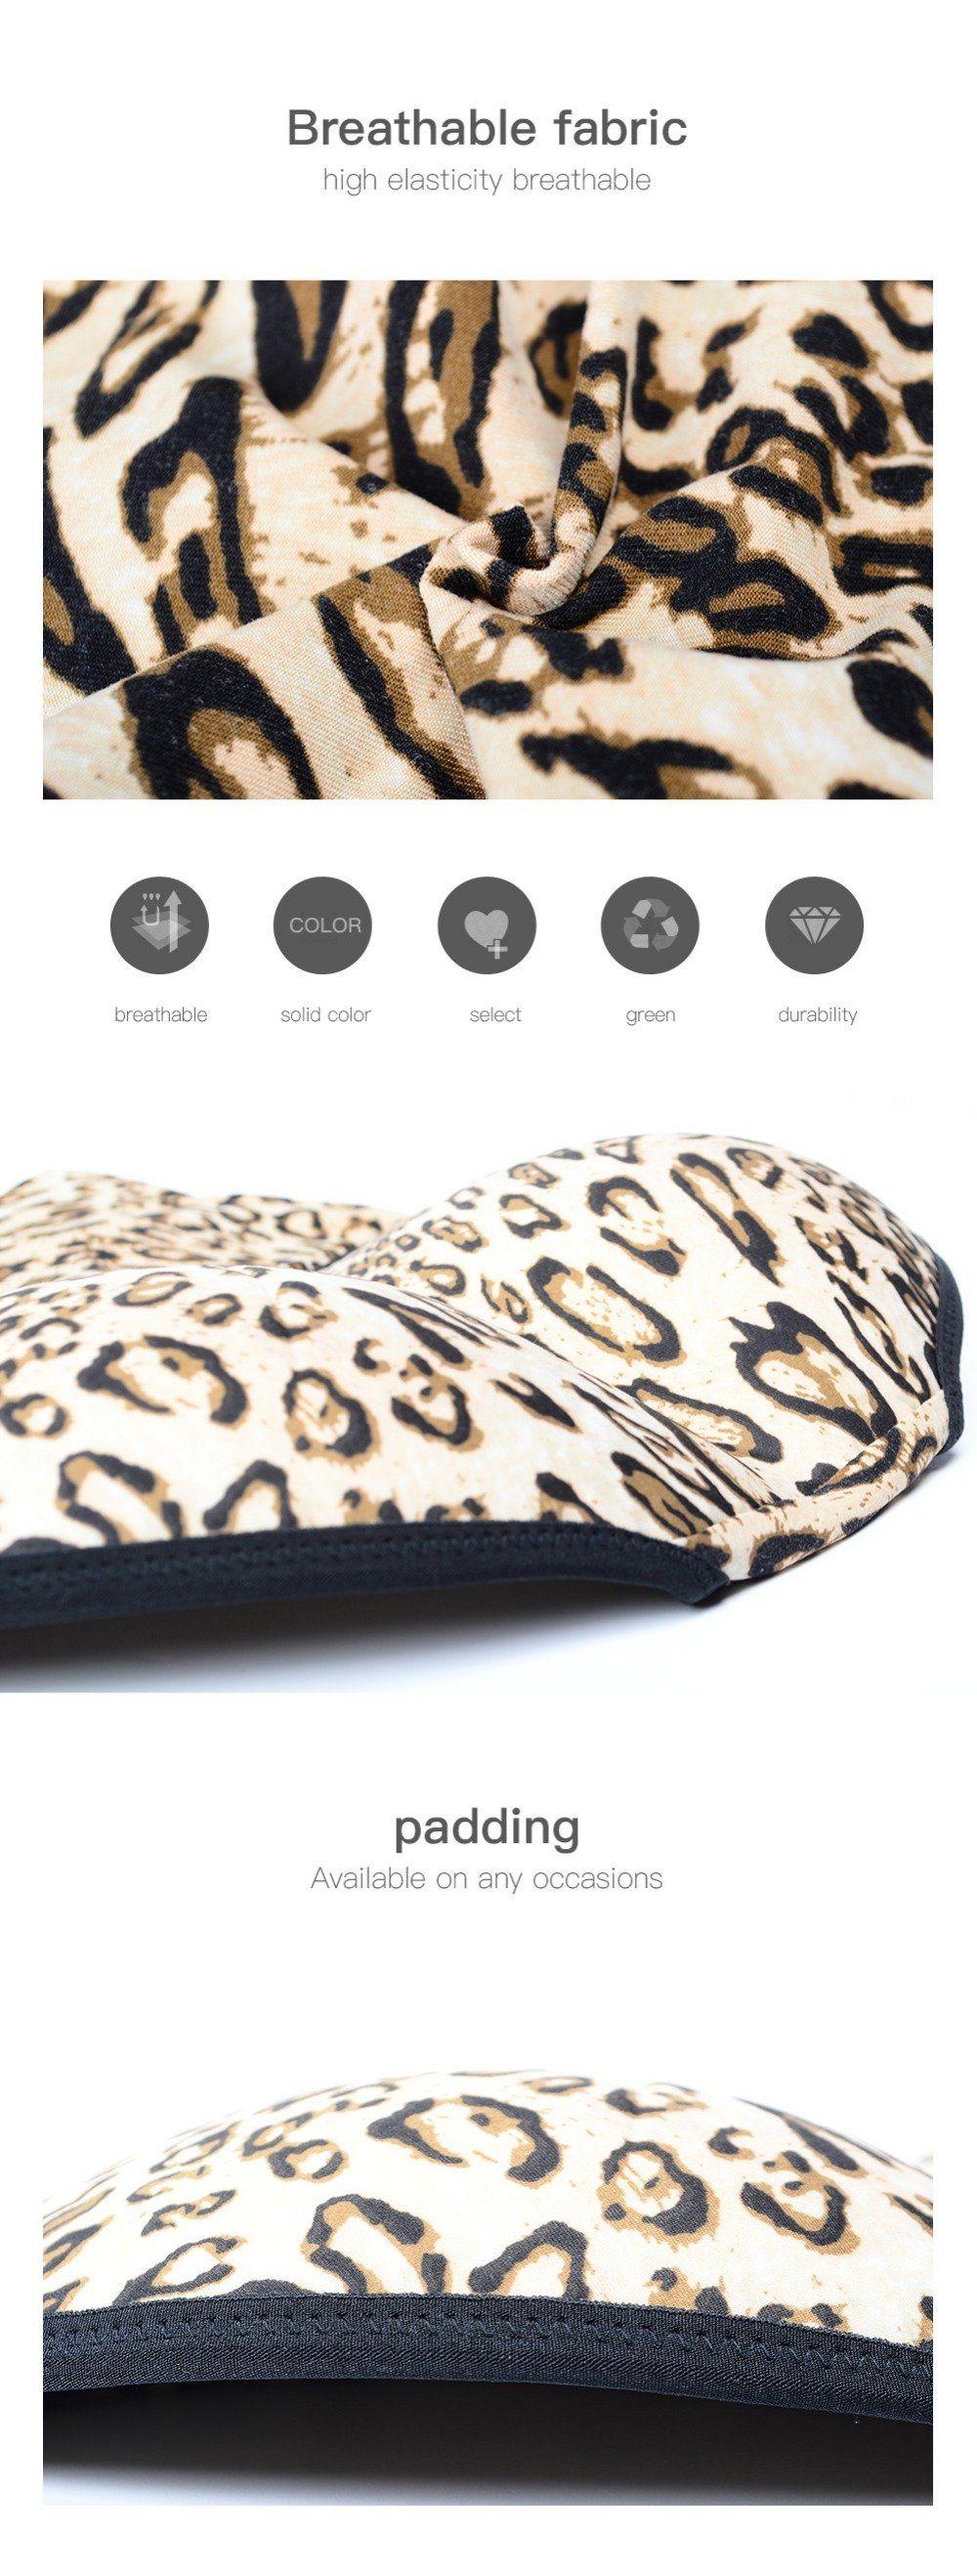 5cccc59088 Body Shaper Leopard Print Slimming Briefs Butt Lifter Hip Enhancer High  Waist Seamless Rear Shaper Tummy Control Padded Panties With Hip Pads